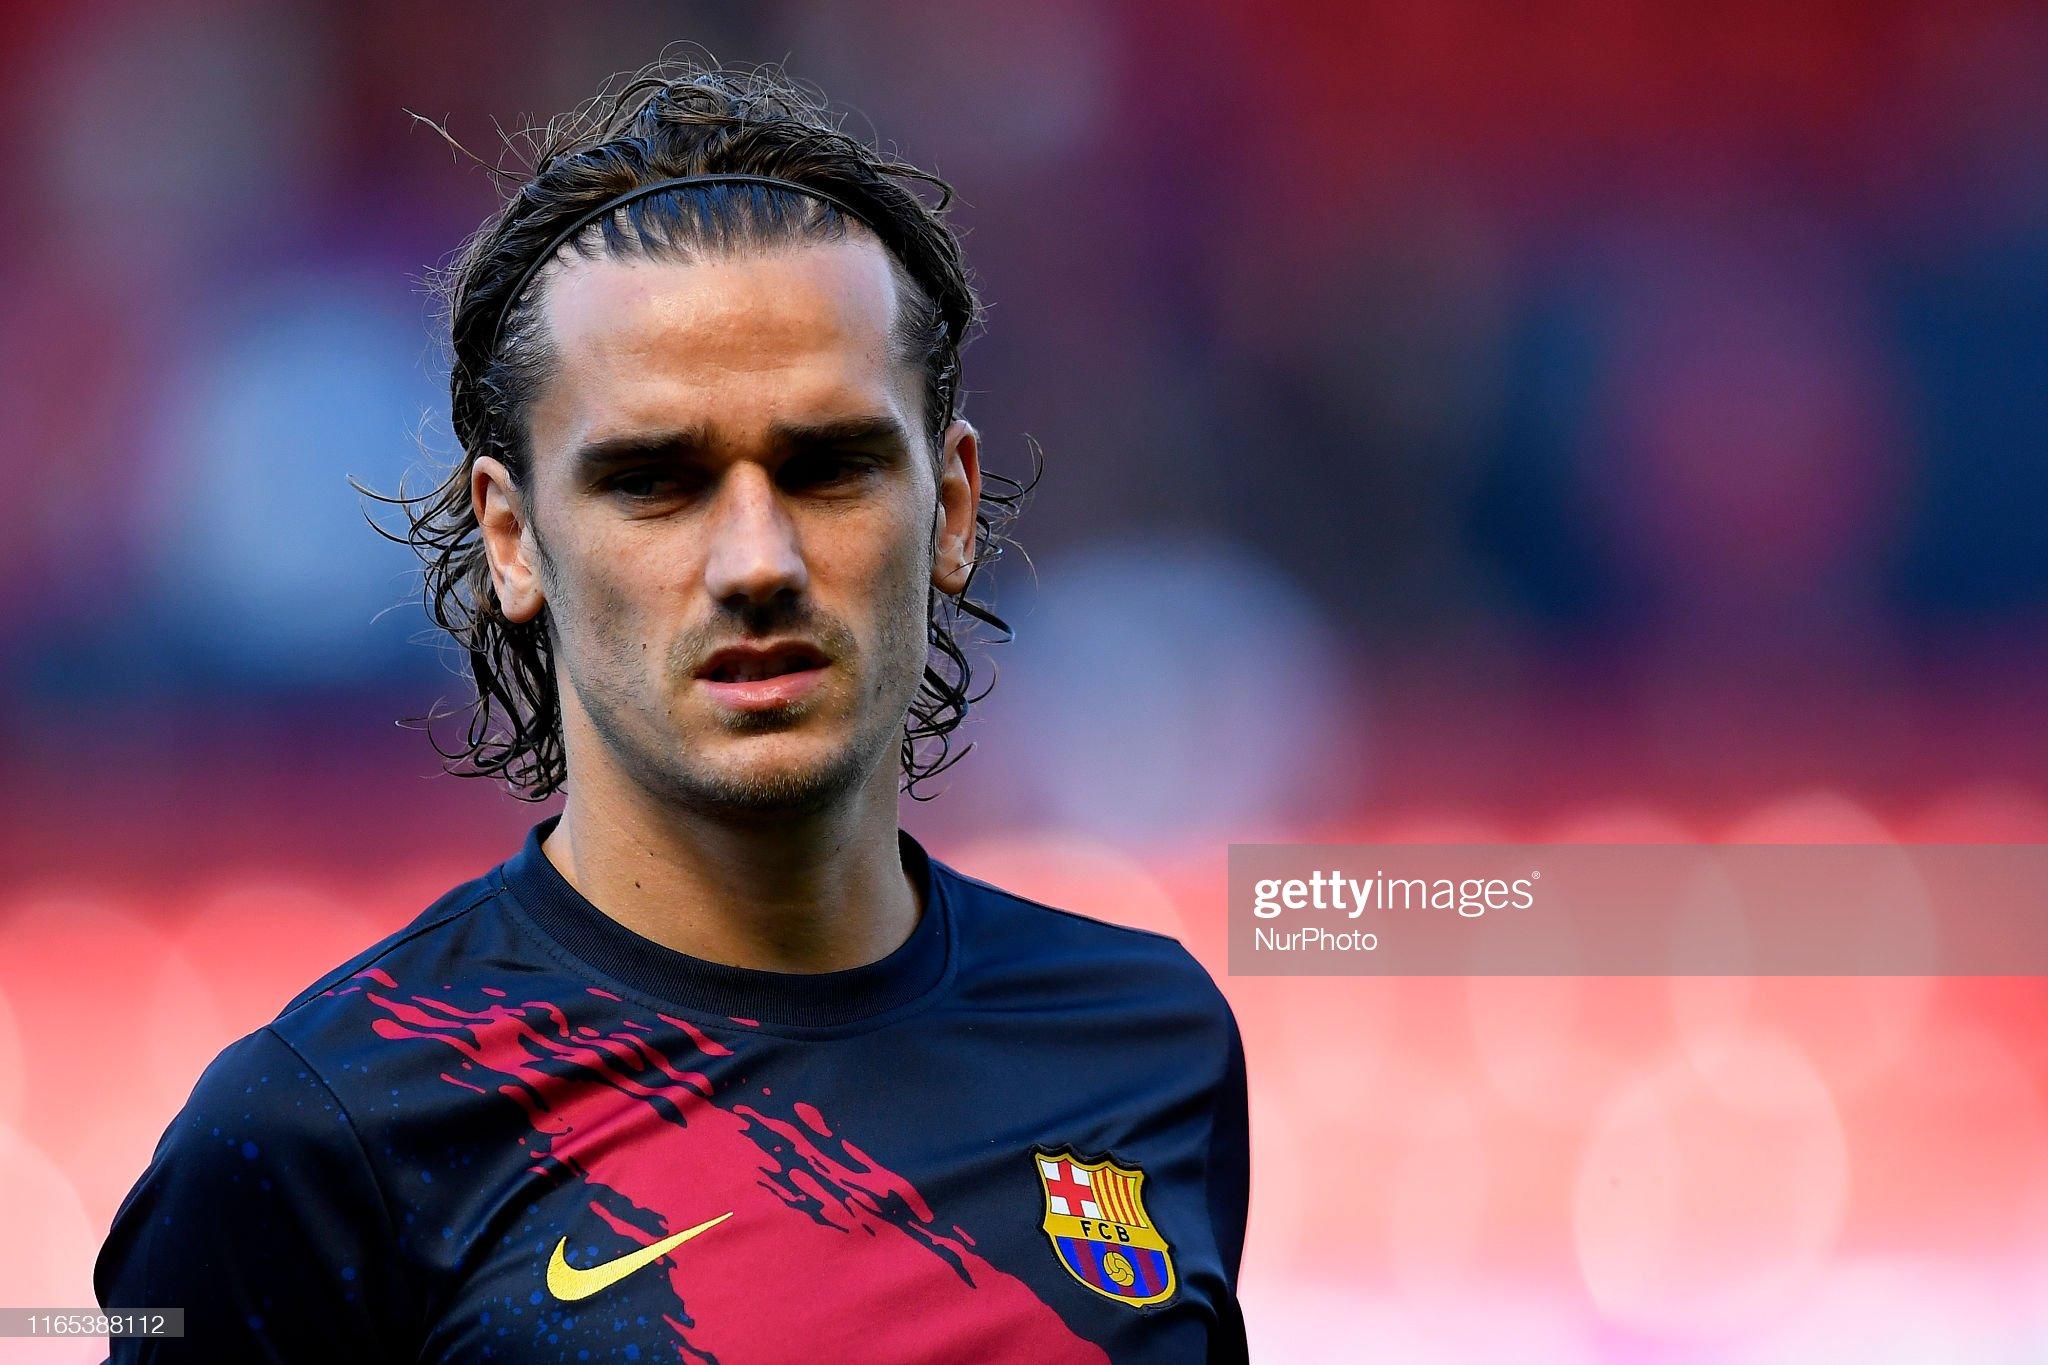 صور مباراة : أوساسونا - برشلونة 2-2 ( 31-08-2019 )  Antoine-griezmann-of-barcelona-during-the-warmup-before-the-liga-ca-picture-id1165388112?s=2048x2048